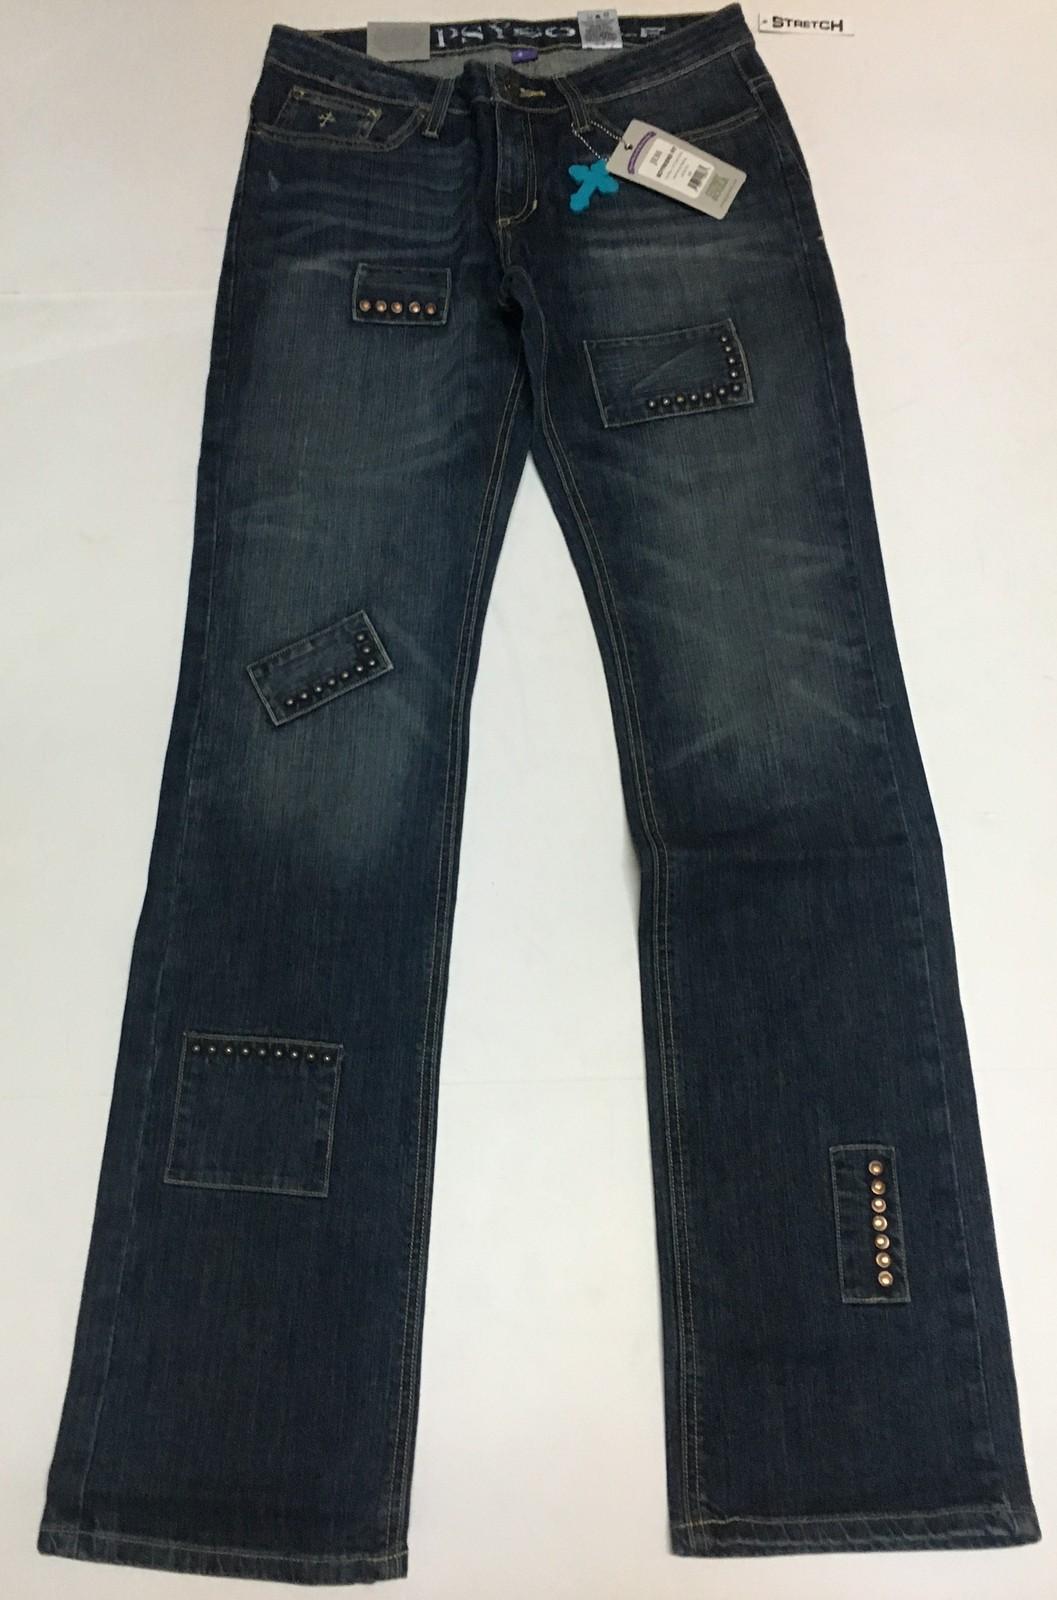 Women's Gypsy Soule Boyfriend Blue Jeans Jess Stretch Sz 28, 30, 34 Waist image 3